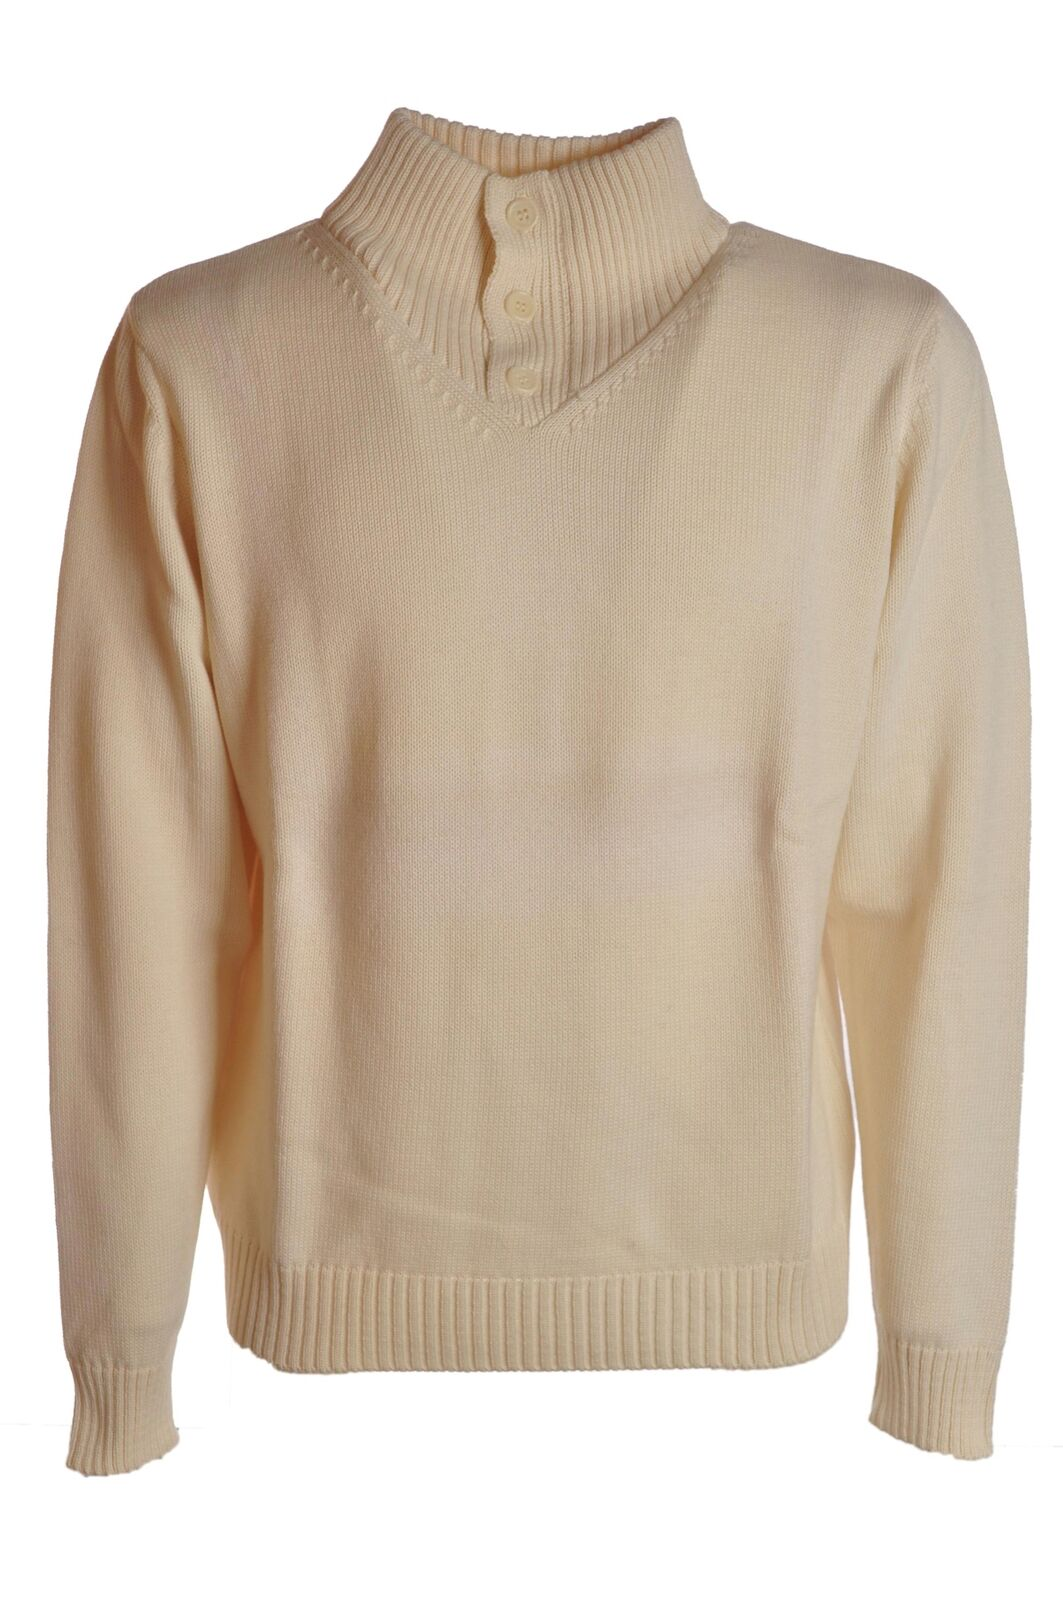 Cube  -  Sweaters - Male - Weiß - 4363526A184438